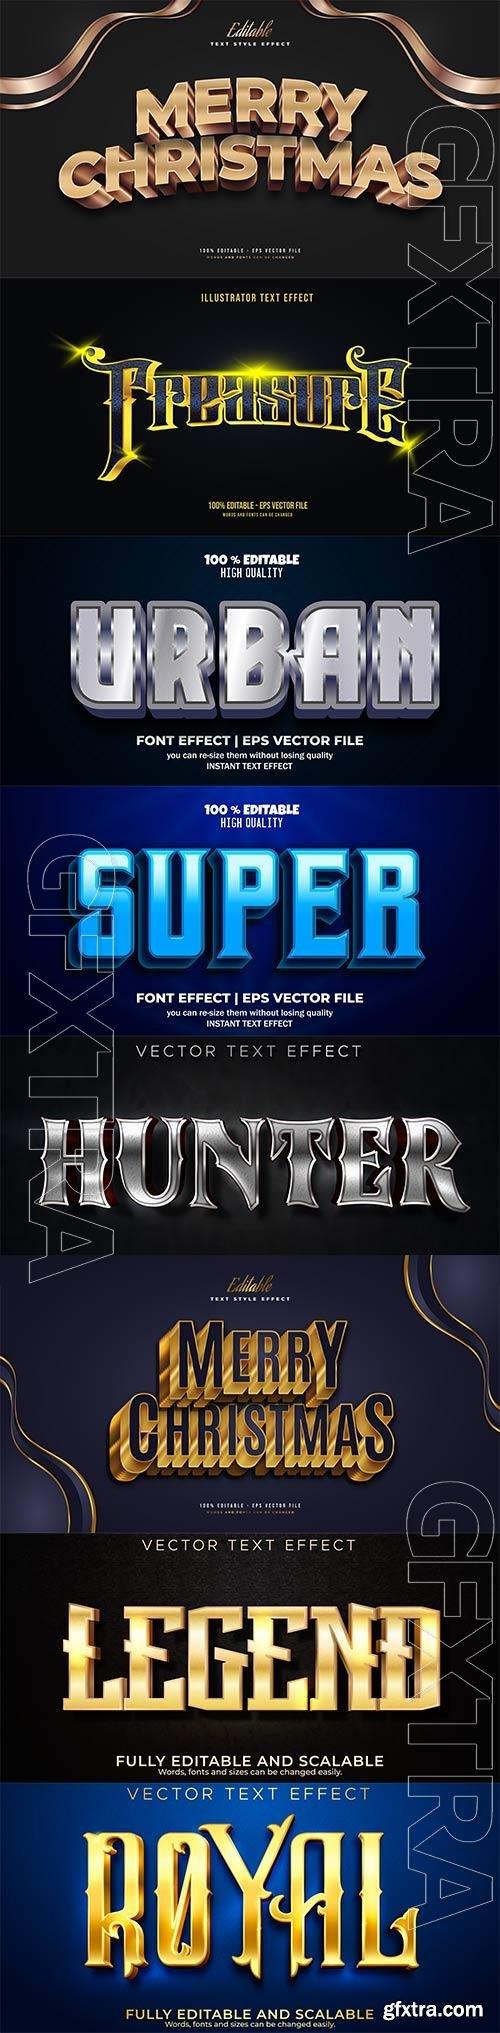 Set 3d editable text style effect vector vol 180